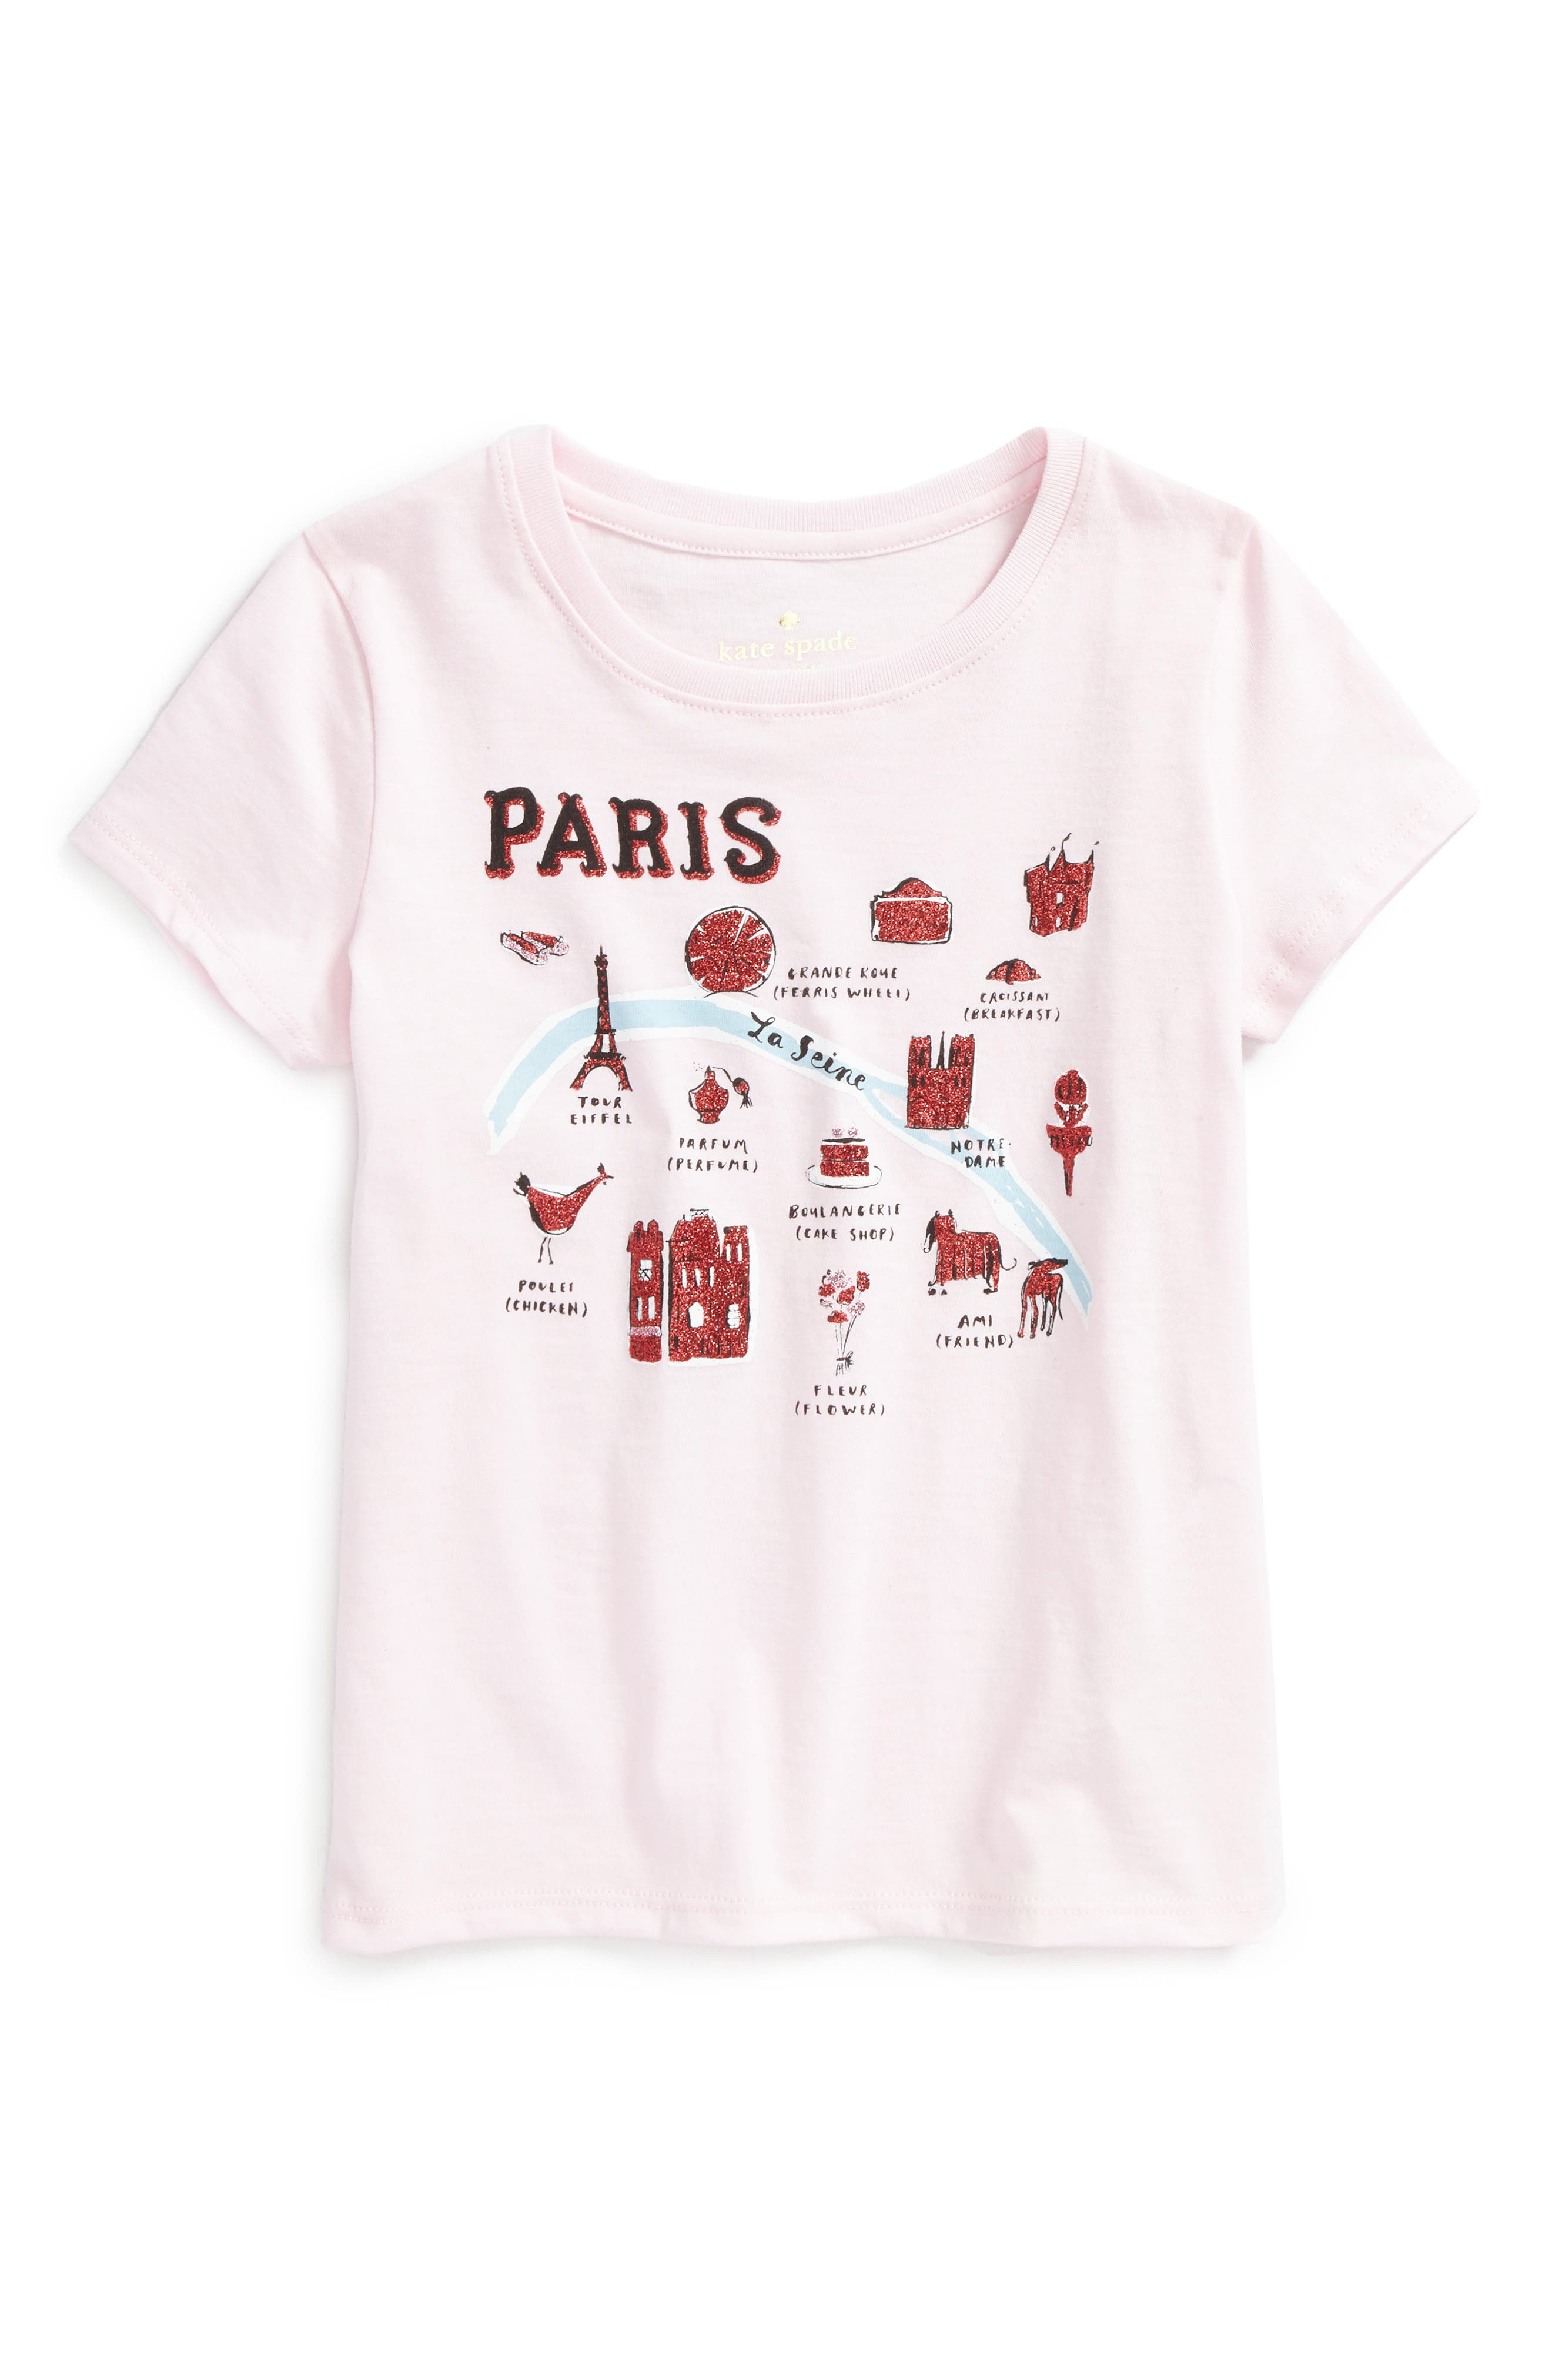 Alternate Image 1 Selected - kate spade new york paris graphic tee (Toddler Girls & Little Girls)